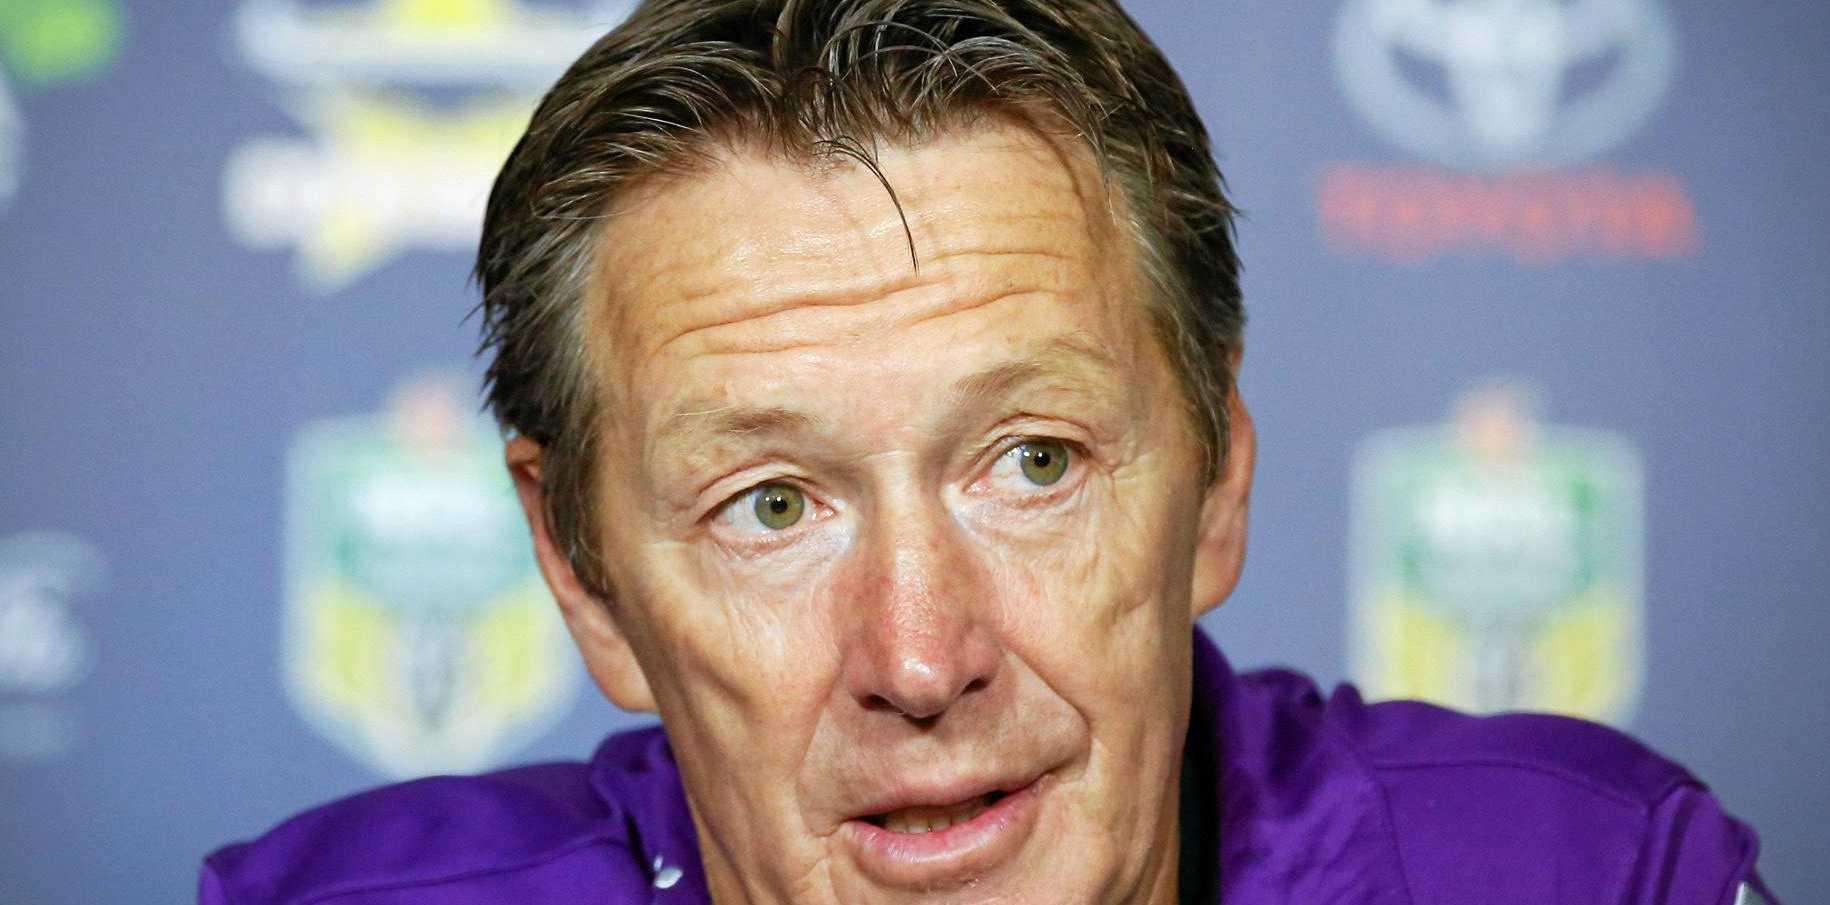 Melbourne Storm coach Craig Bellamy talks at a post-game media conference.